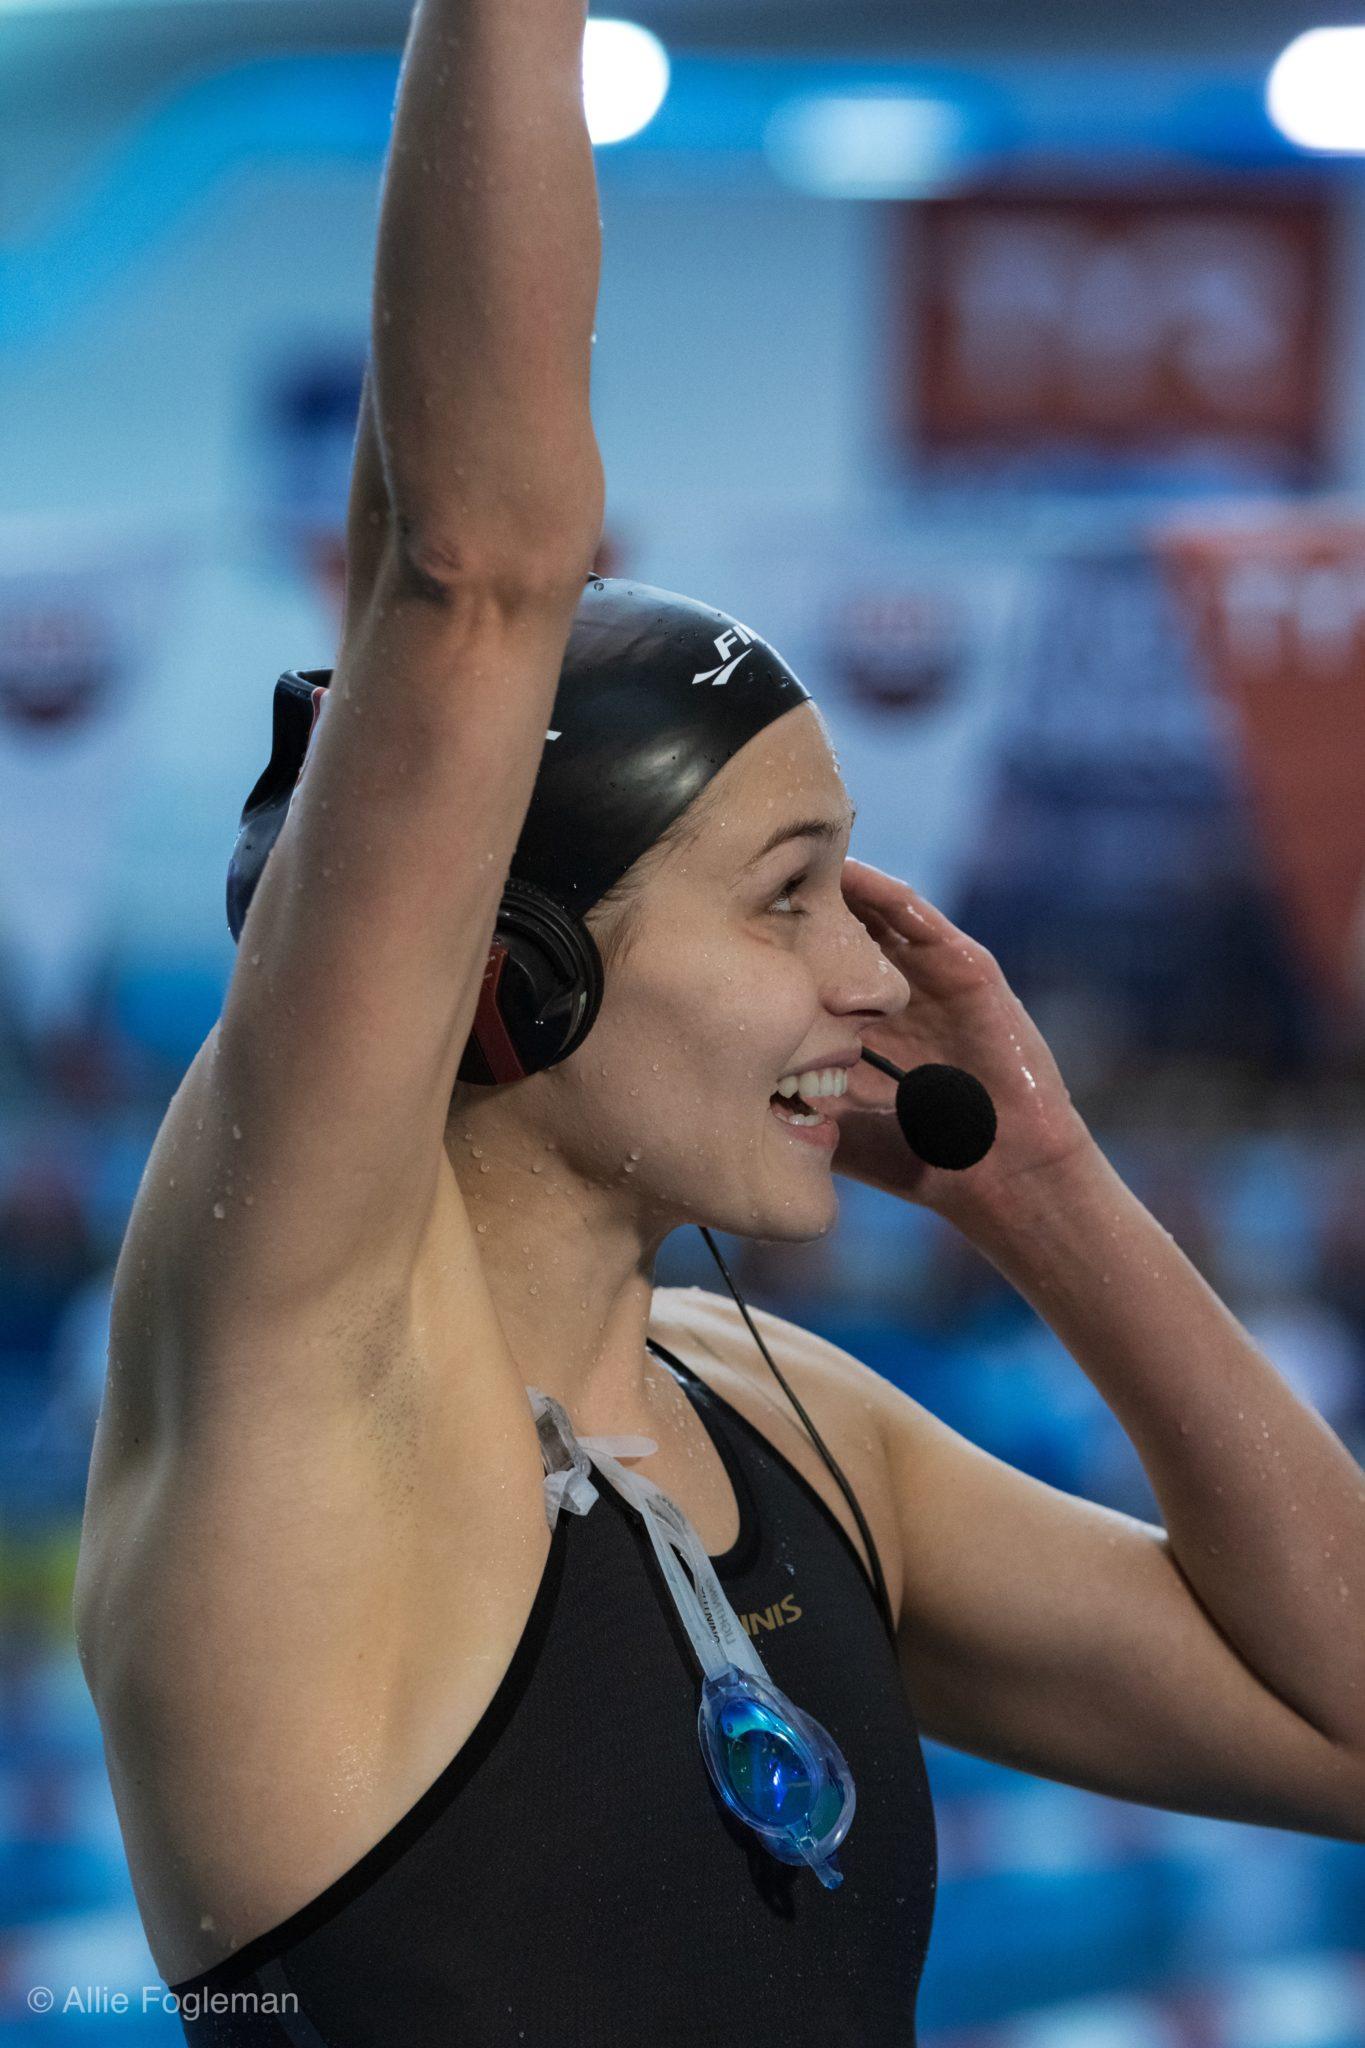 Swimming at the 2019 World Aquatics Championships – Women's 50 metre backstroke